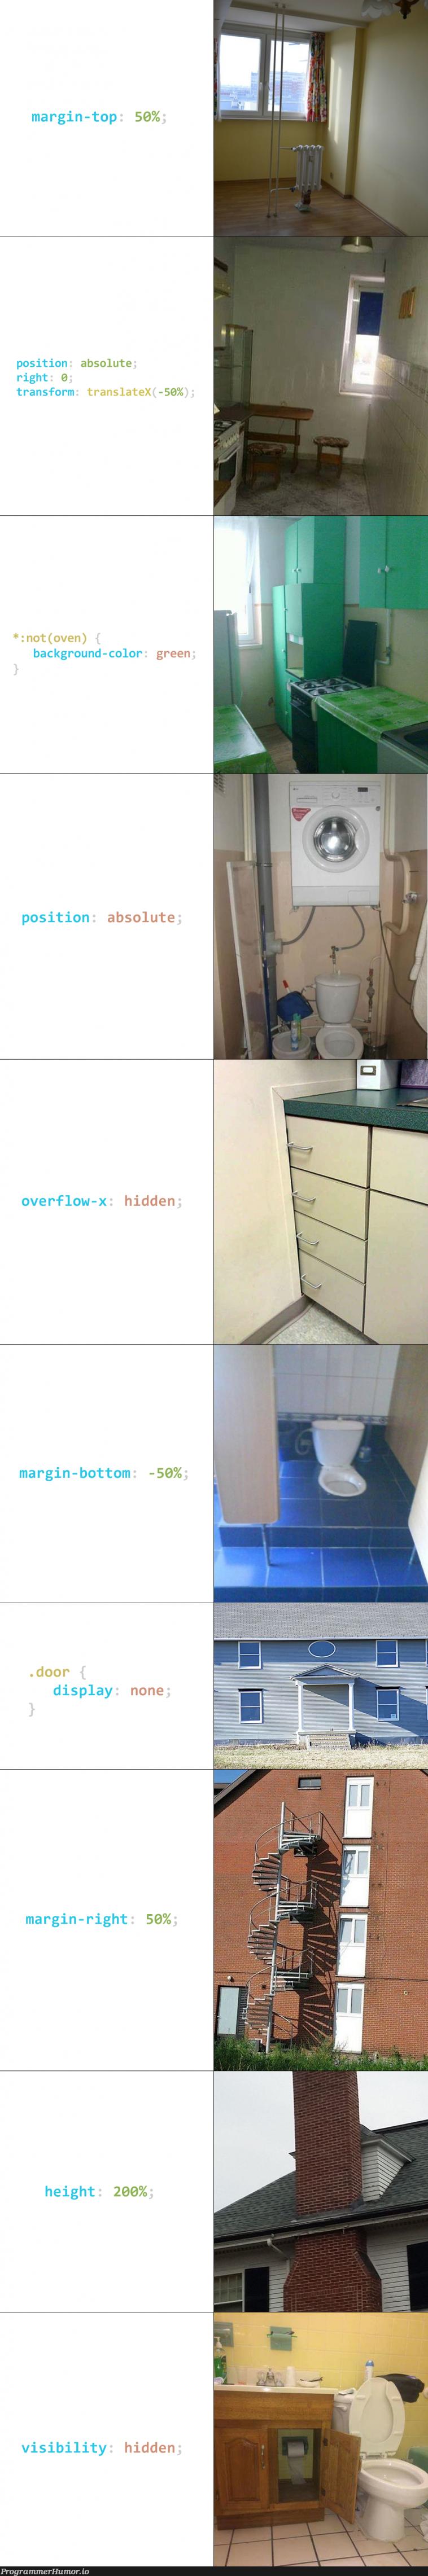 When bad frontends renovate houses   frontend-memes, overflow-memes, bot-memes   ProgrammerHumor.io